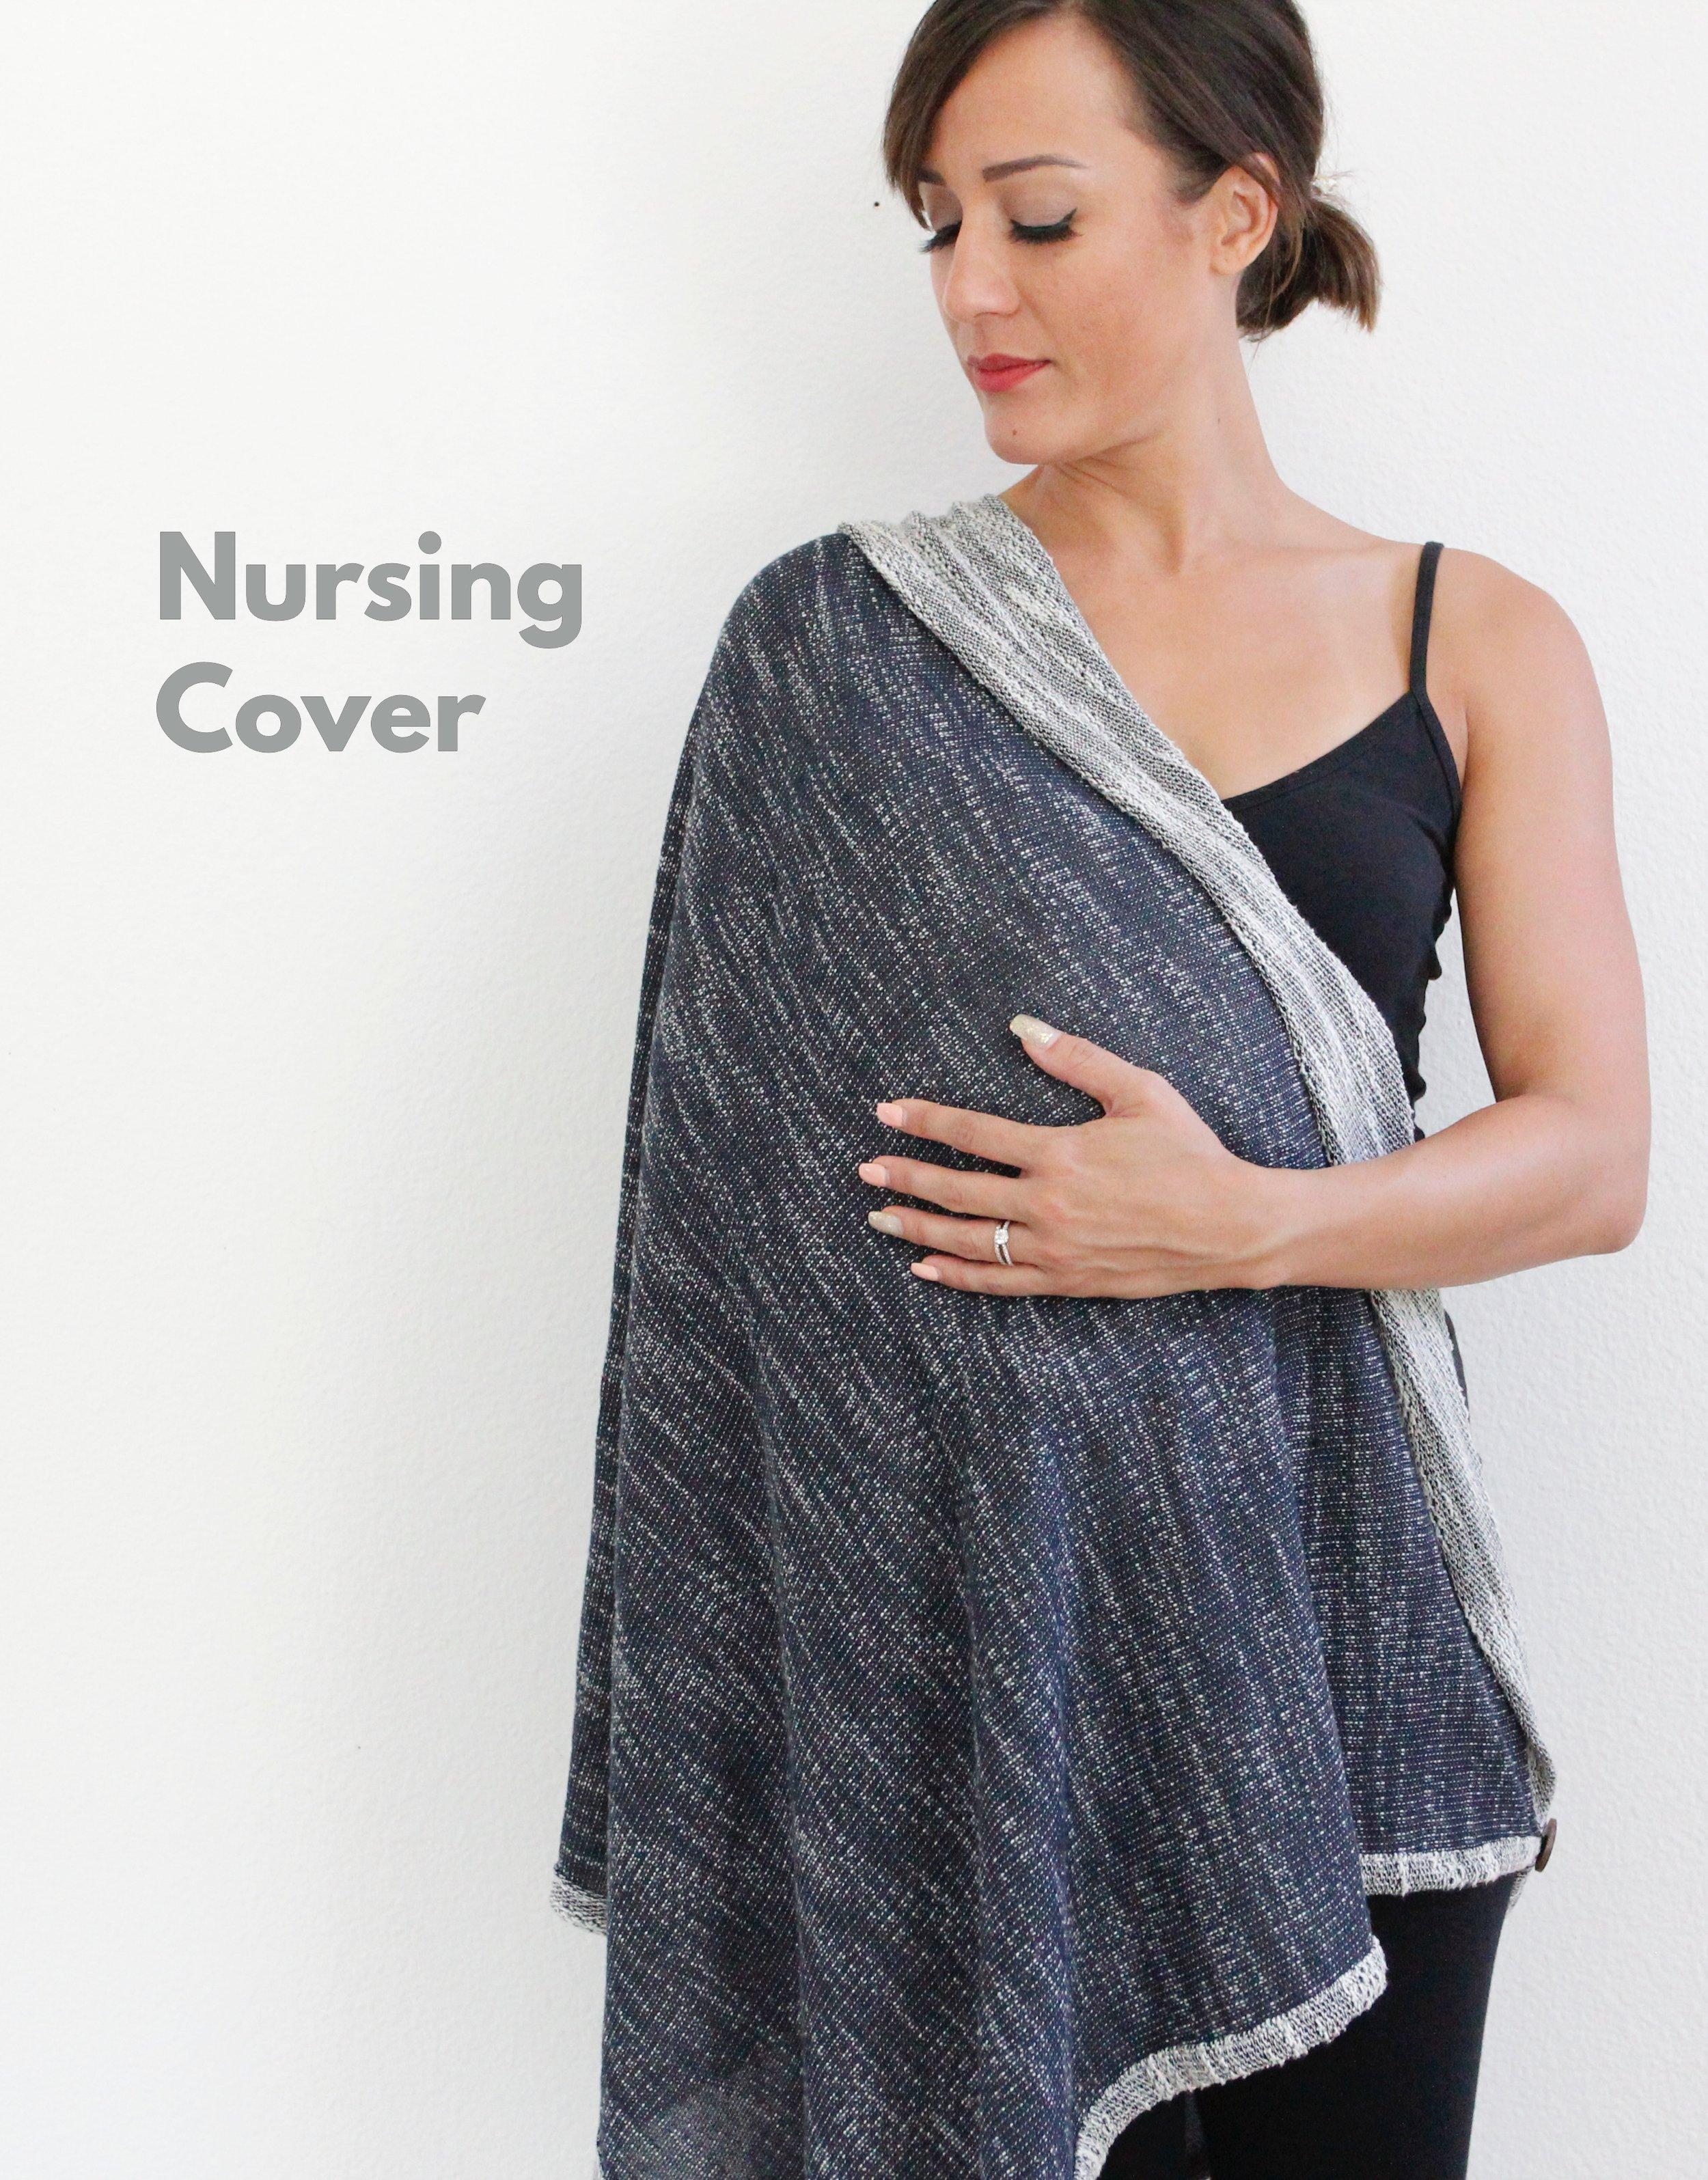 MFS ELLERALI Nursing Cover.jpg